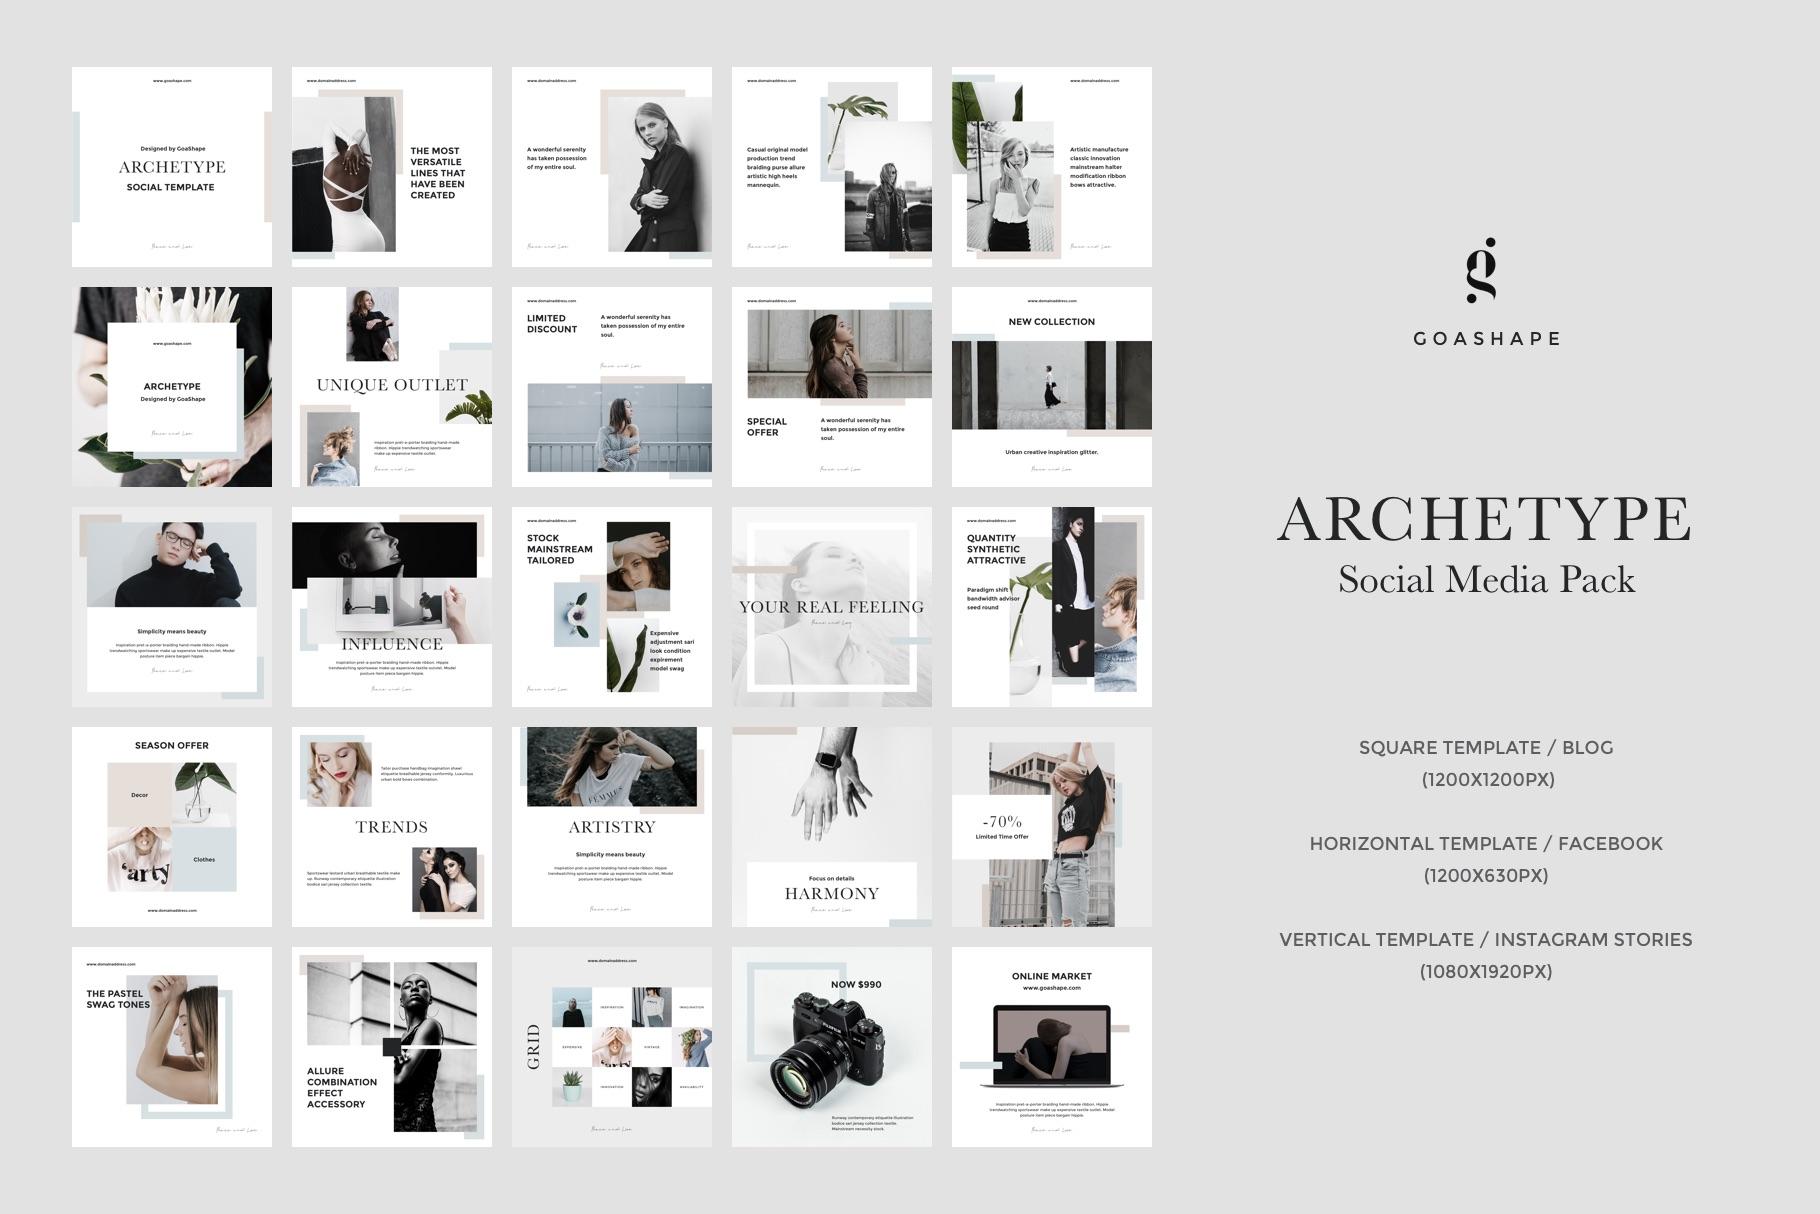 Showcase   archetype social media pack by goashape